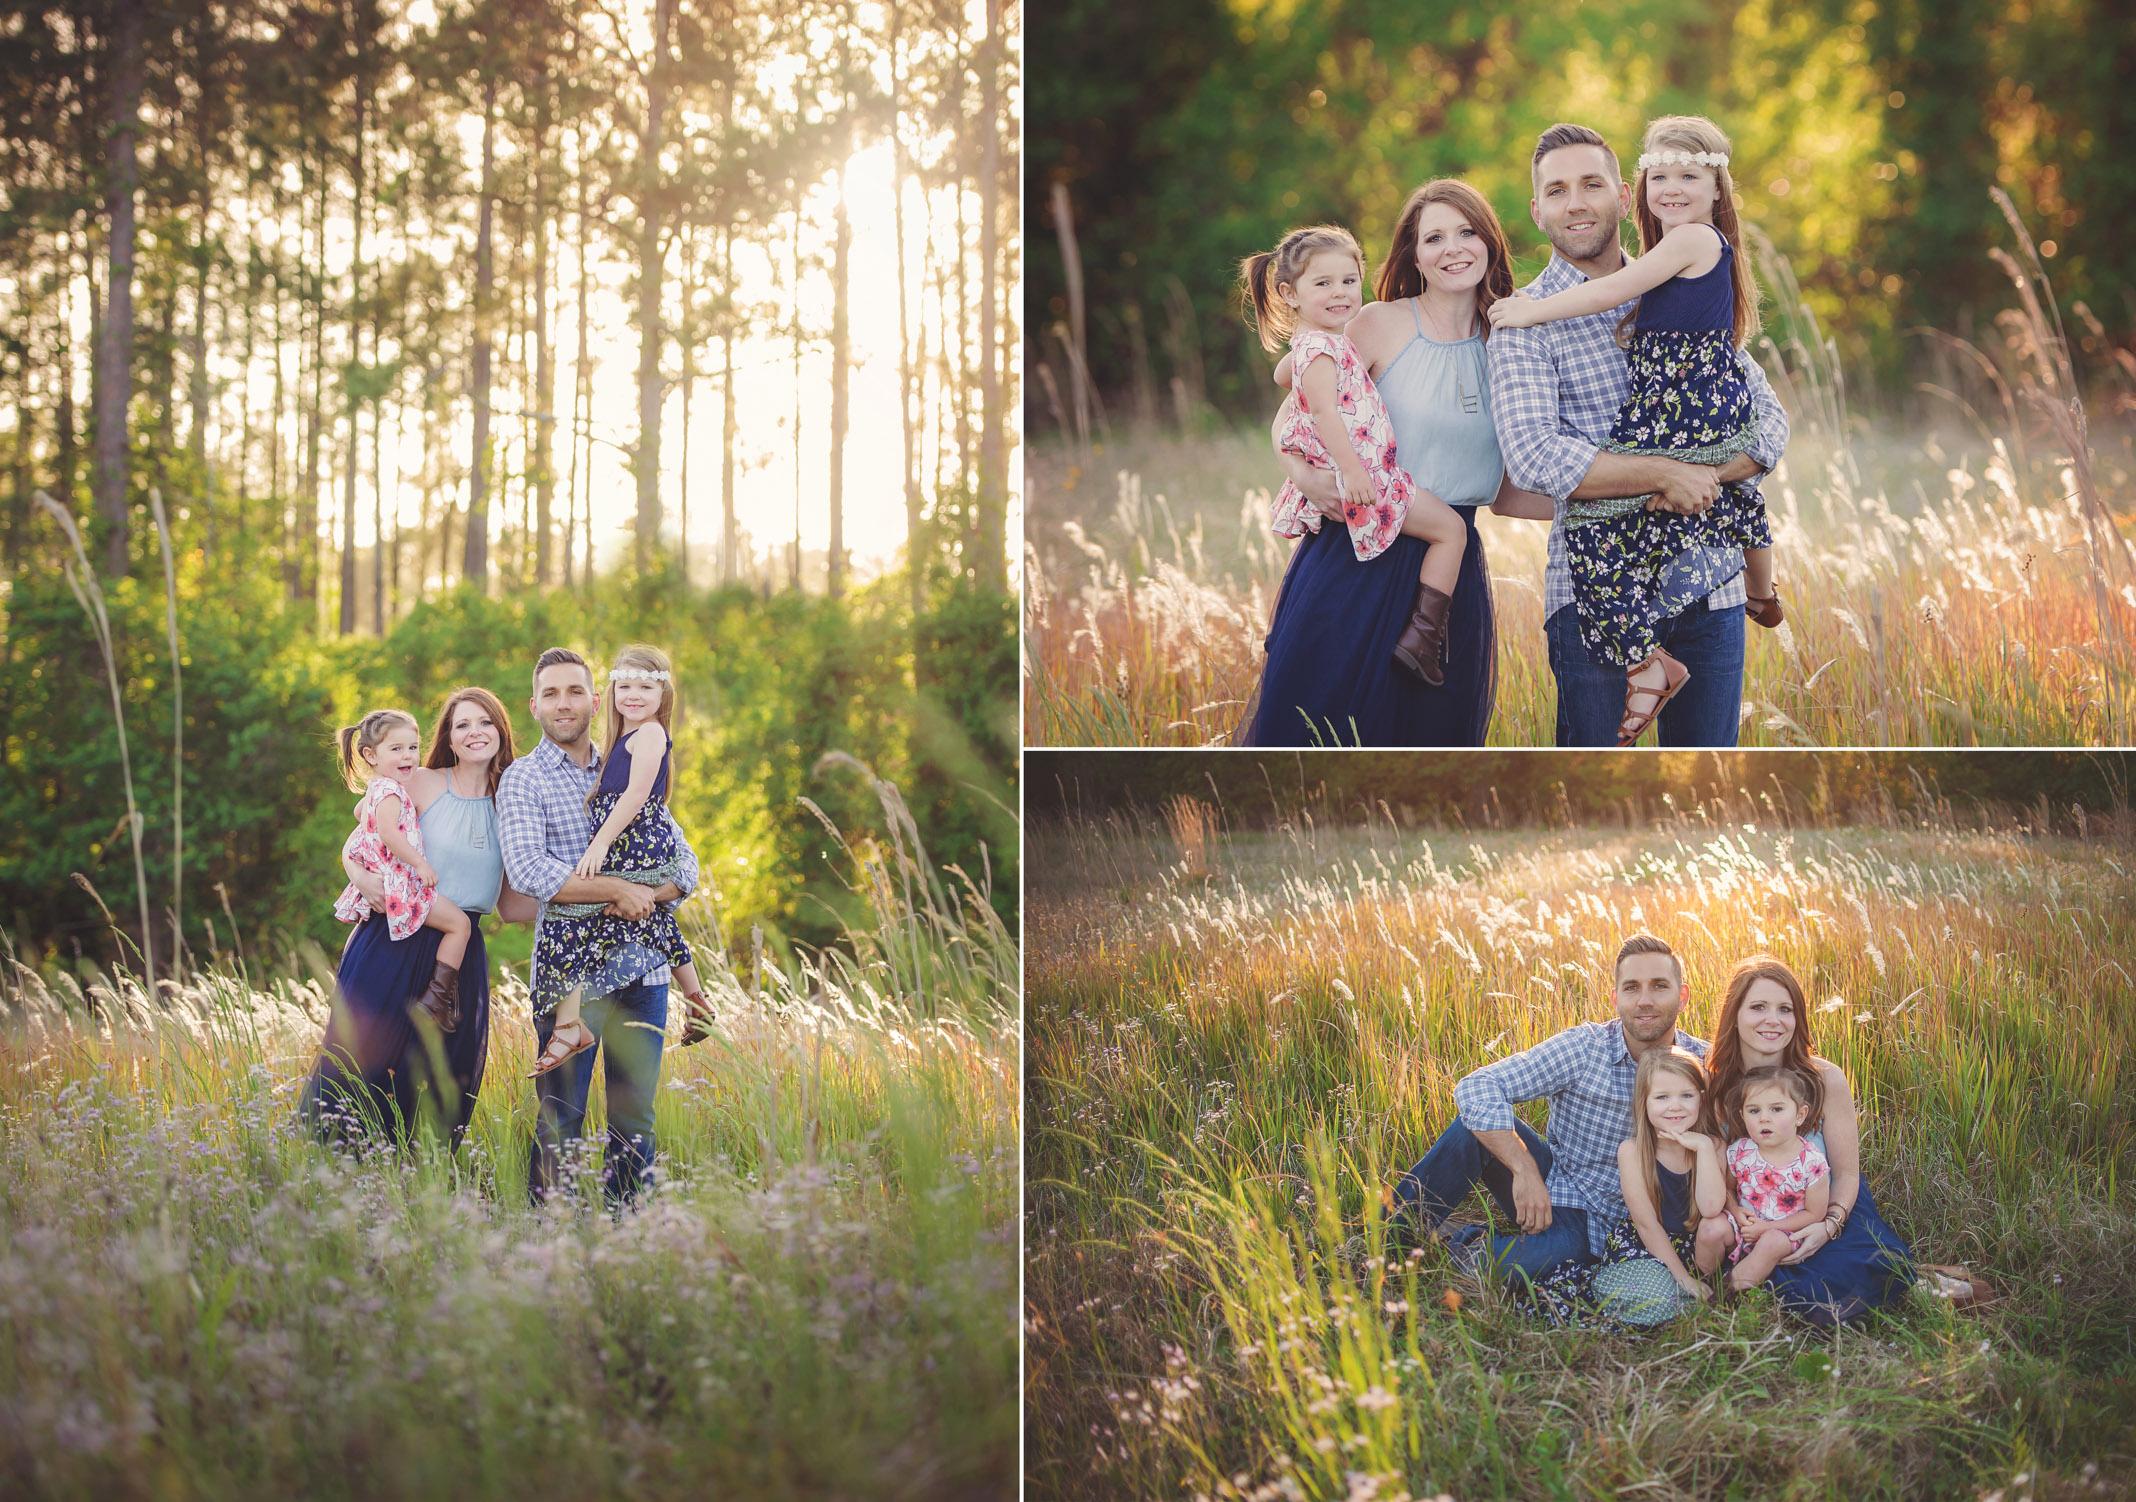 adam-szarmack-family-portraits-photography-love-14.jpg